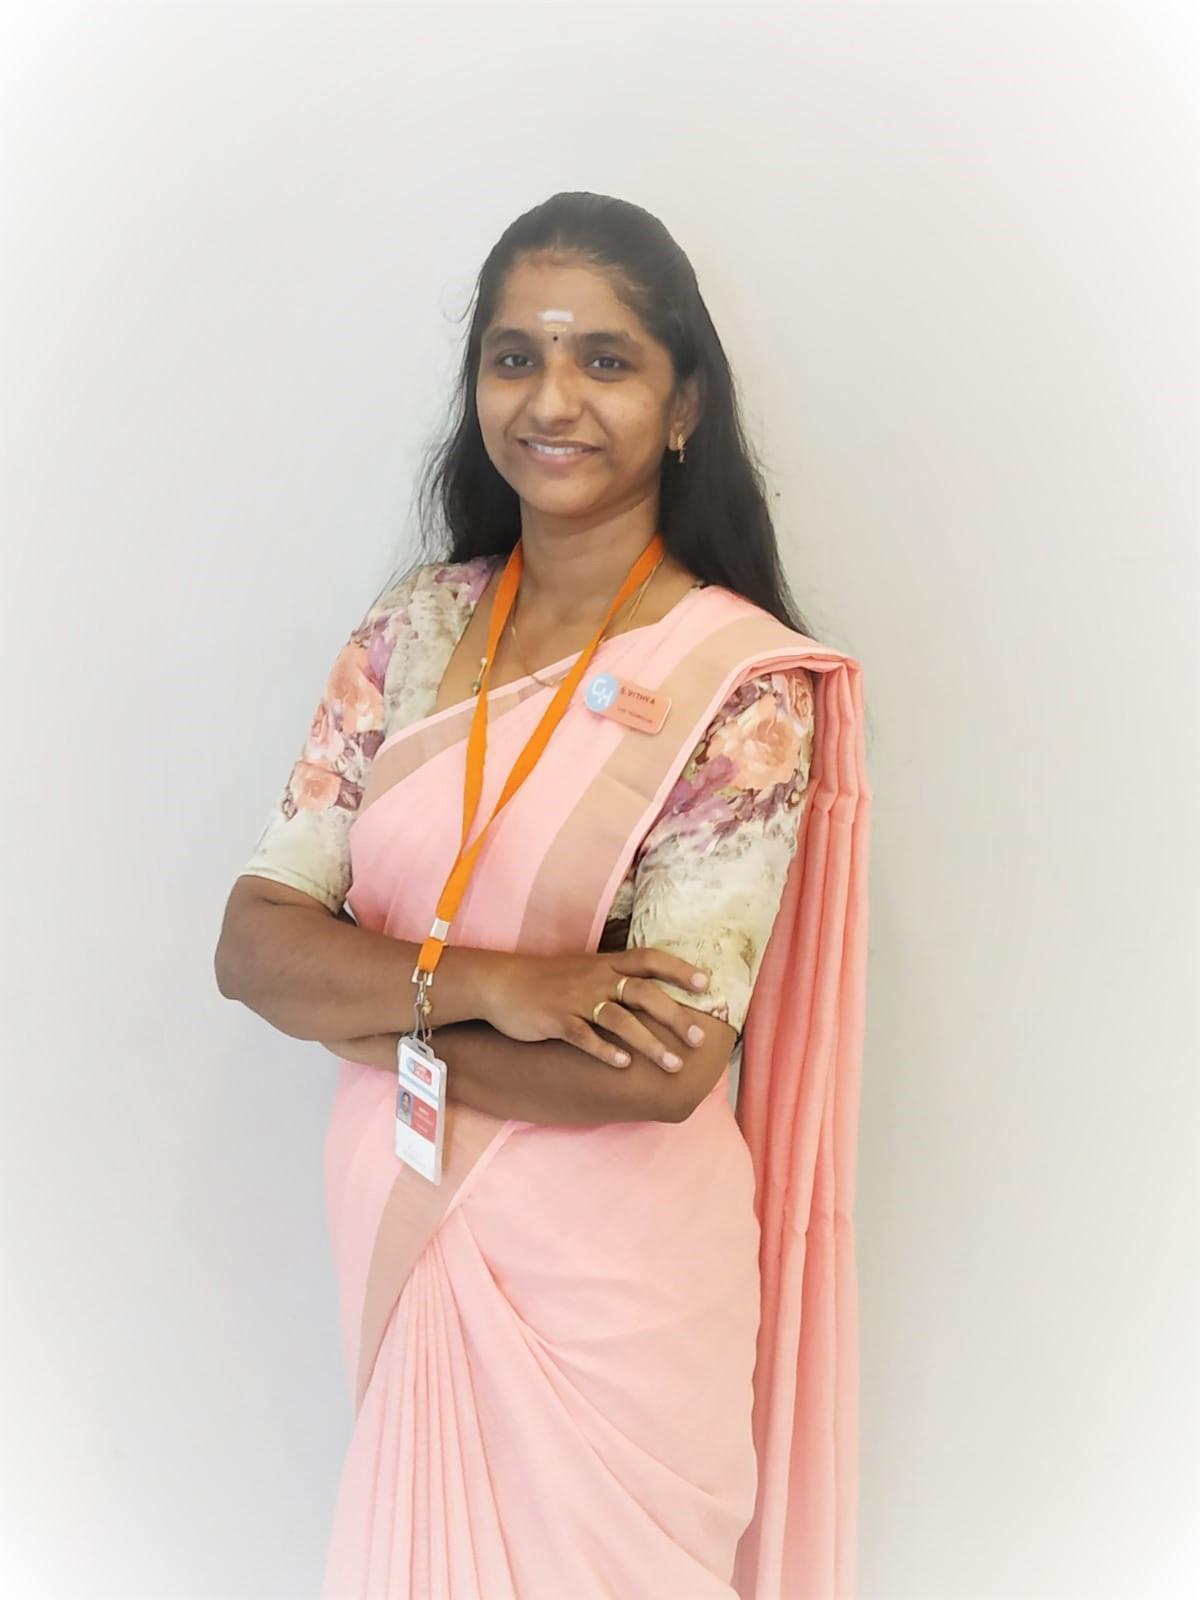 Female staff wearing pink saree